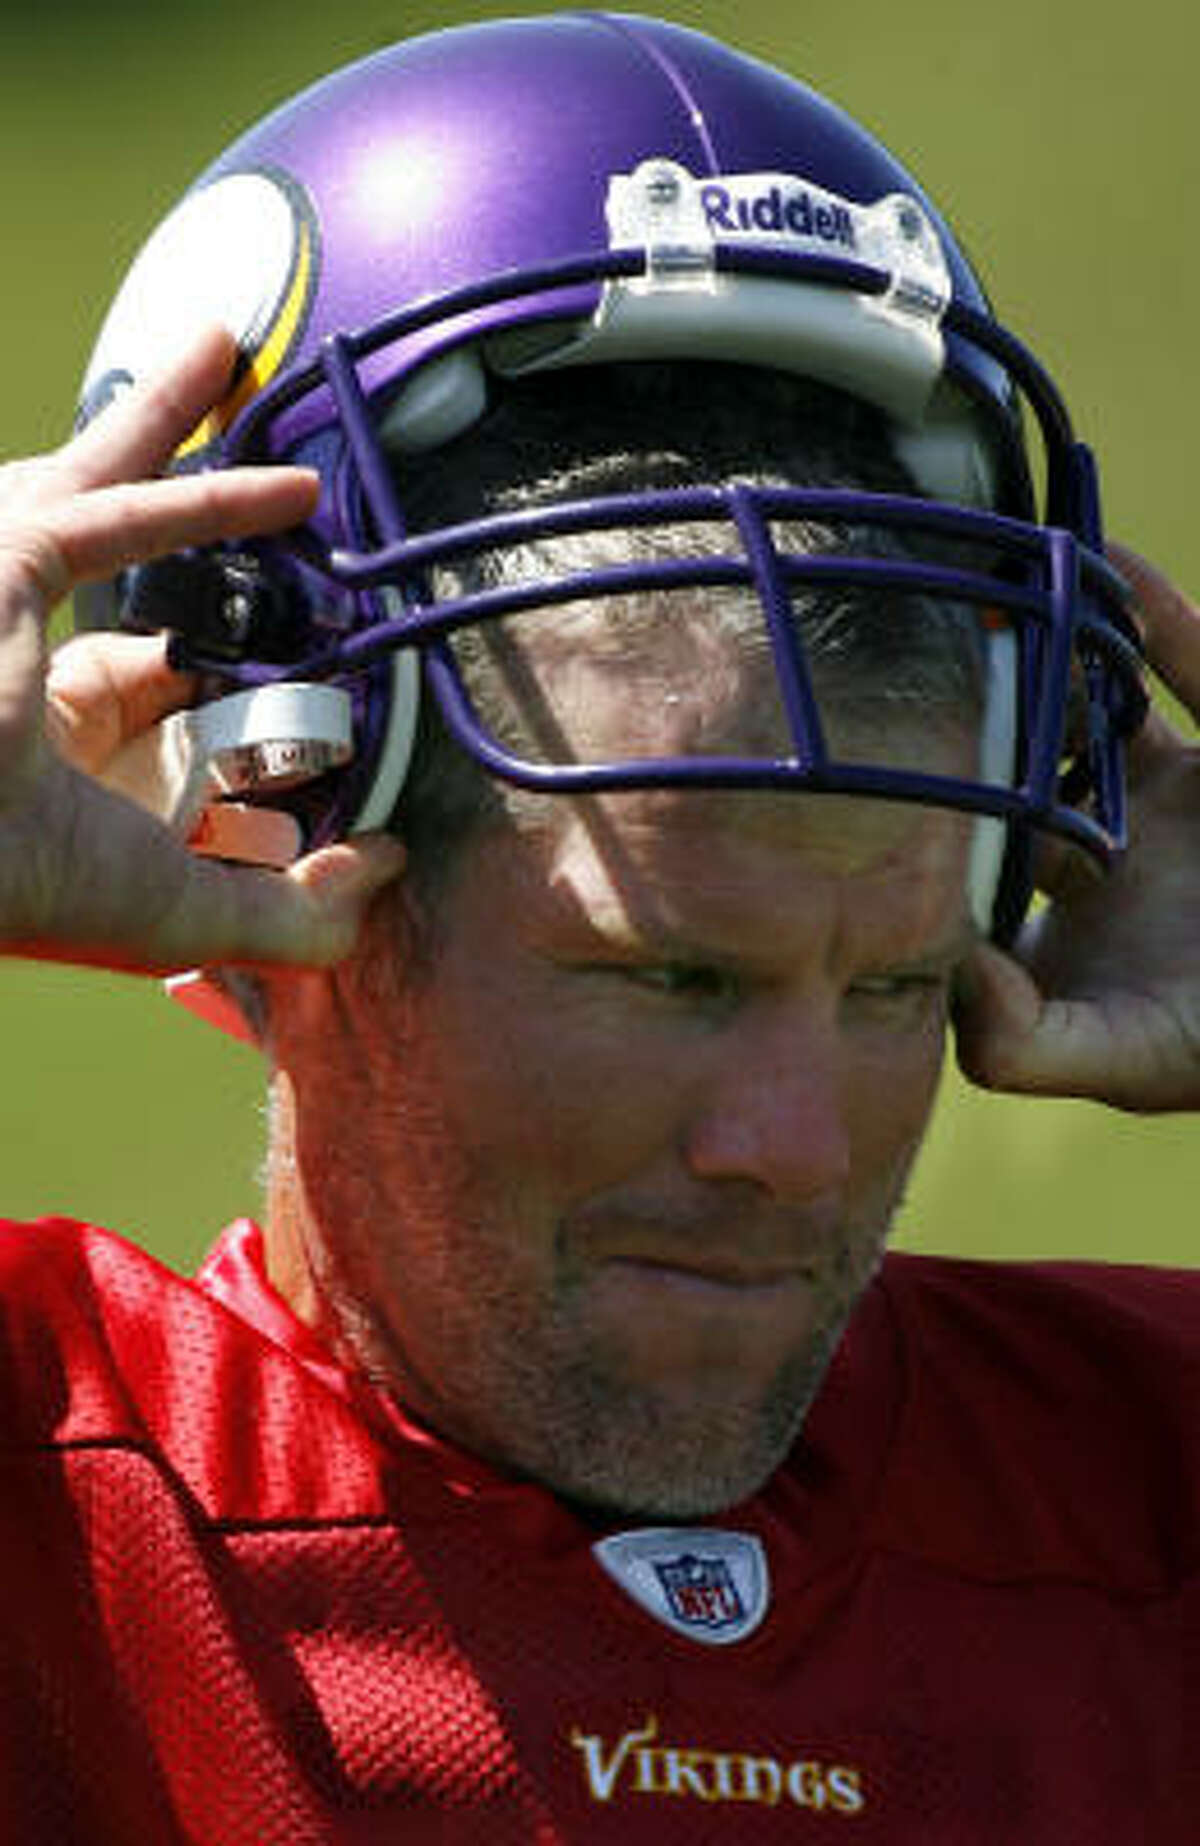 New Minnesota Vikings quarterback Brett Favre looks on during NFL football training camp Tuesday, Aug. 18, 2009, in Eden Prairie, Minn. (AP Photo/Star Tribune, David Joles) ** ST. PAUL OUT, MINNEAPOLIS-AREA TV OUT m MAGS OUT **